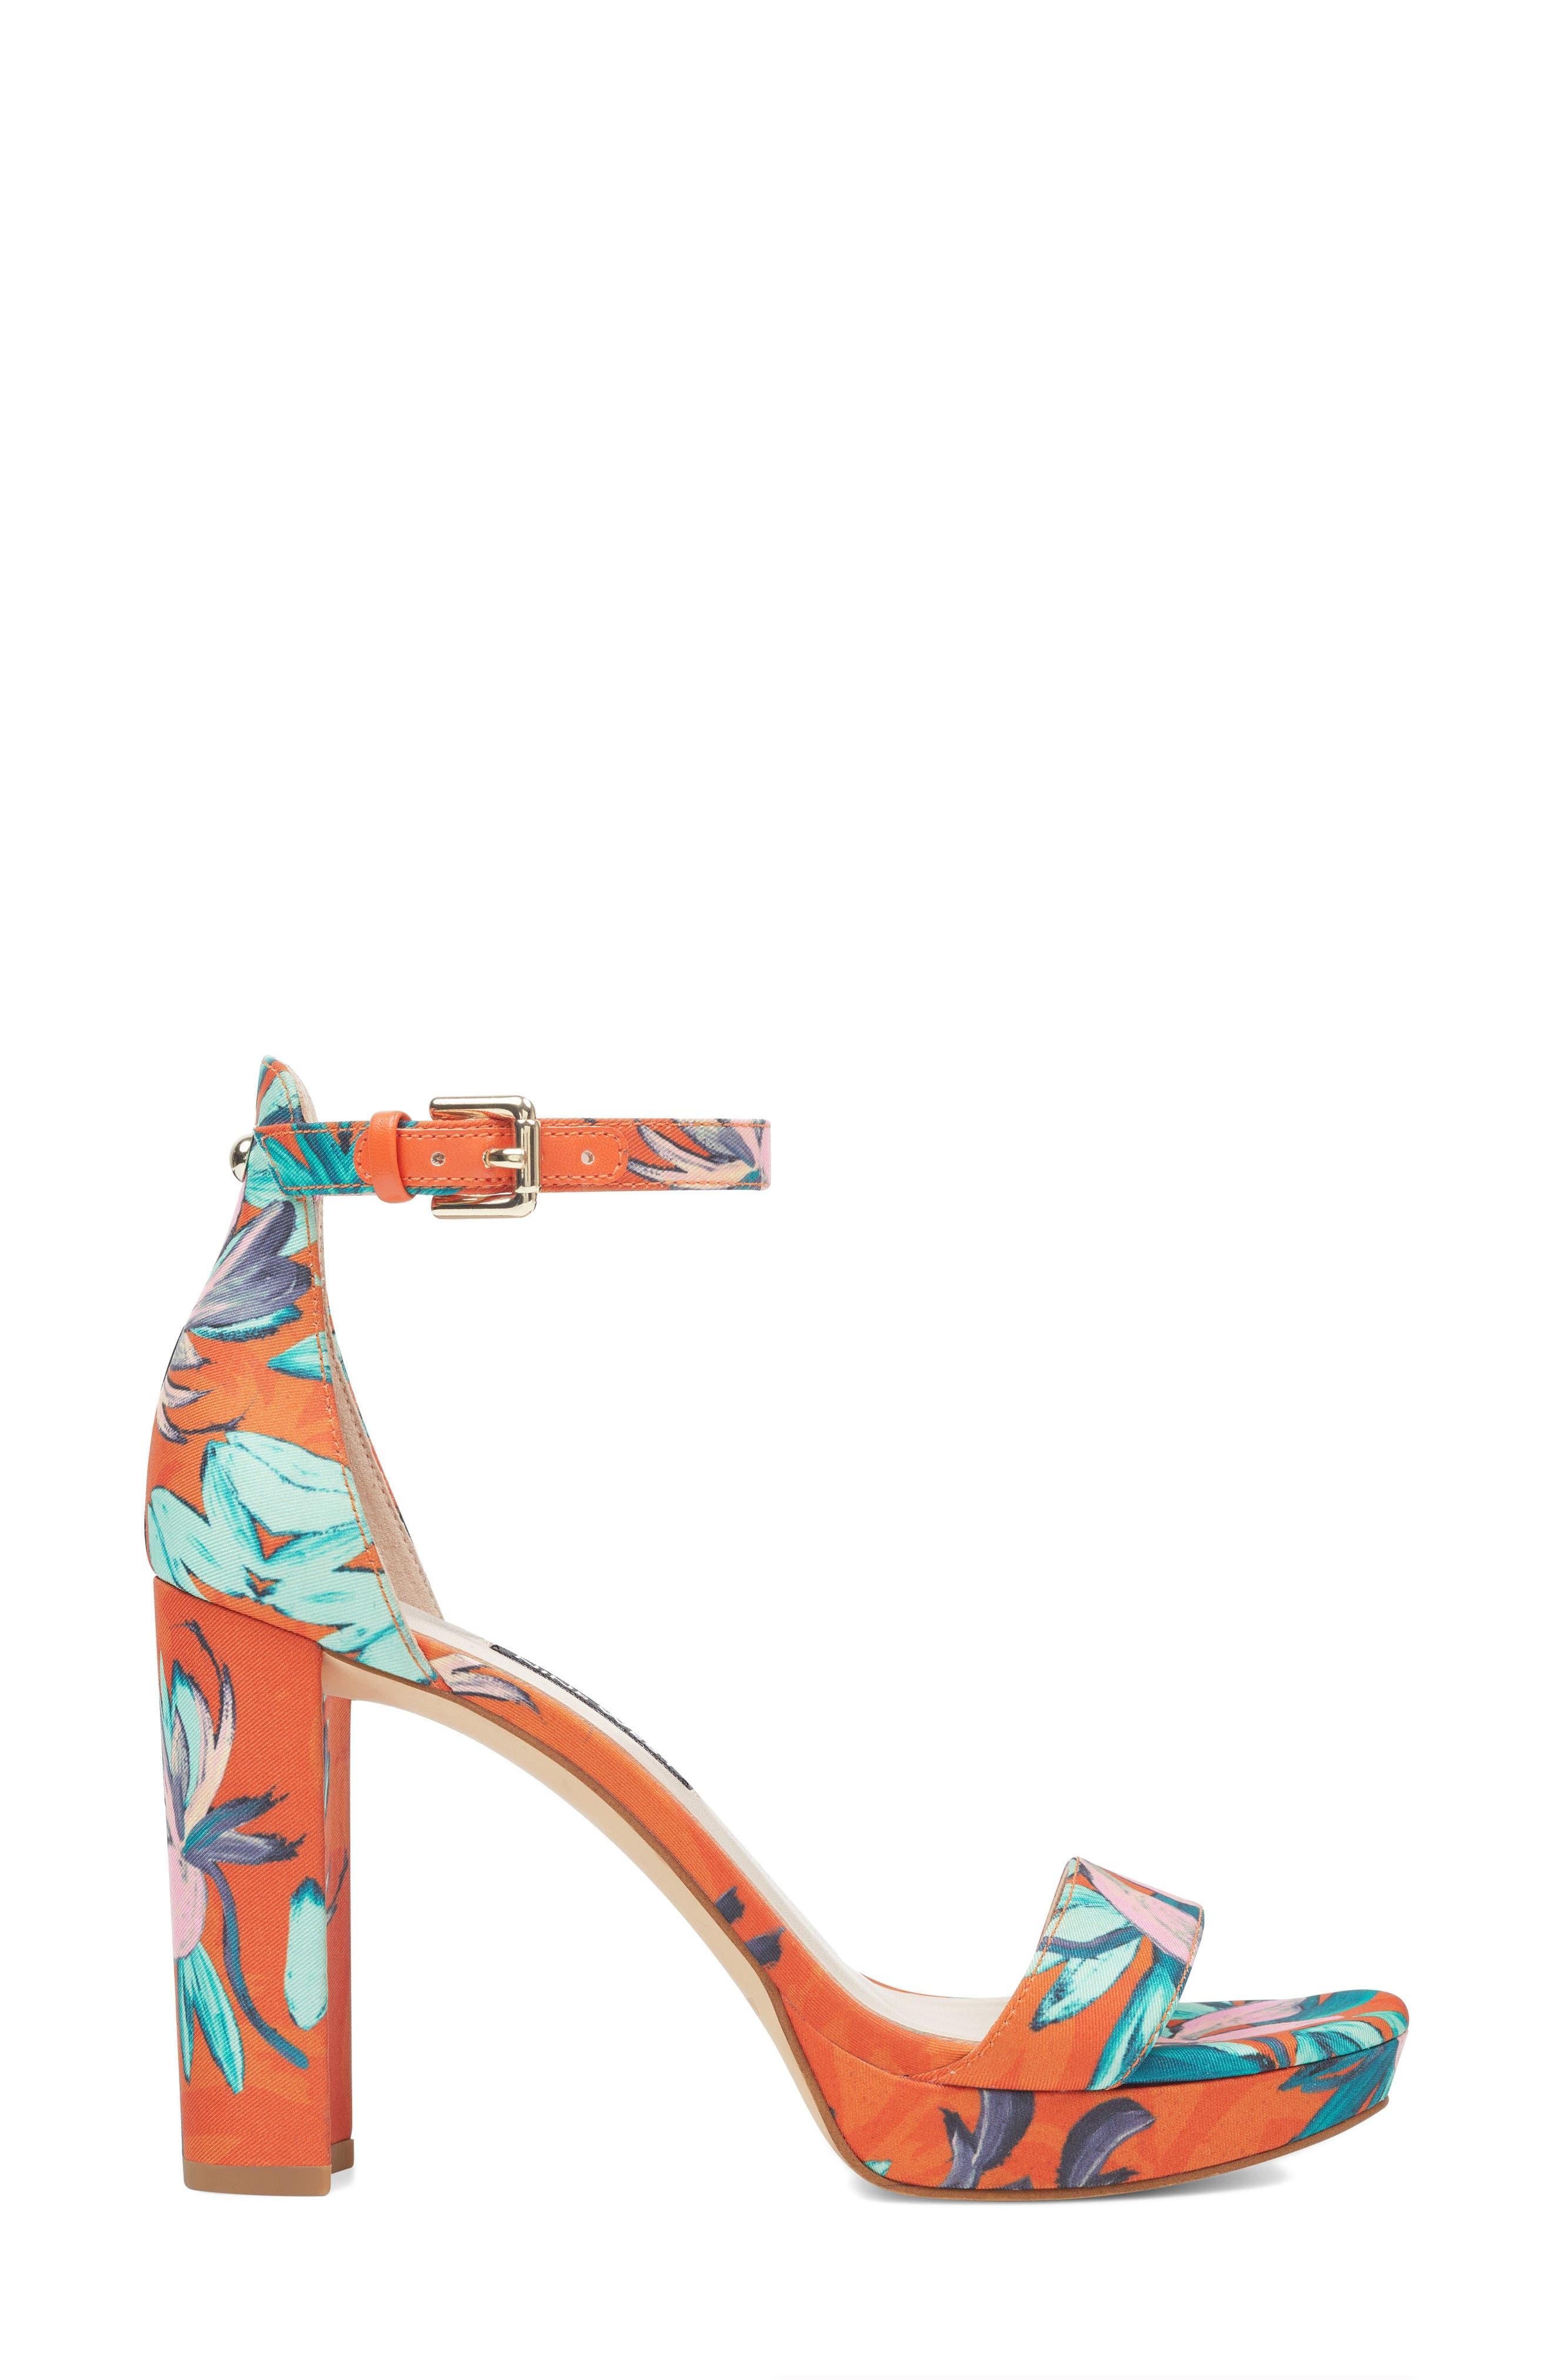 Dempsey Platform Sandal,                             Alternate thumbnail 3, color,                             ORANGE MULTI FABRIC